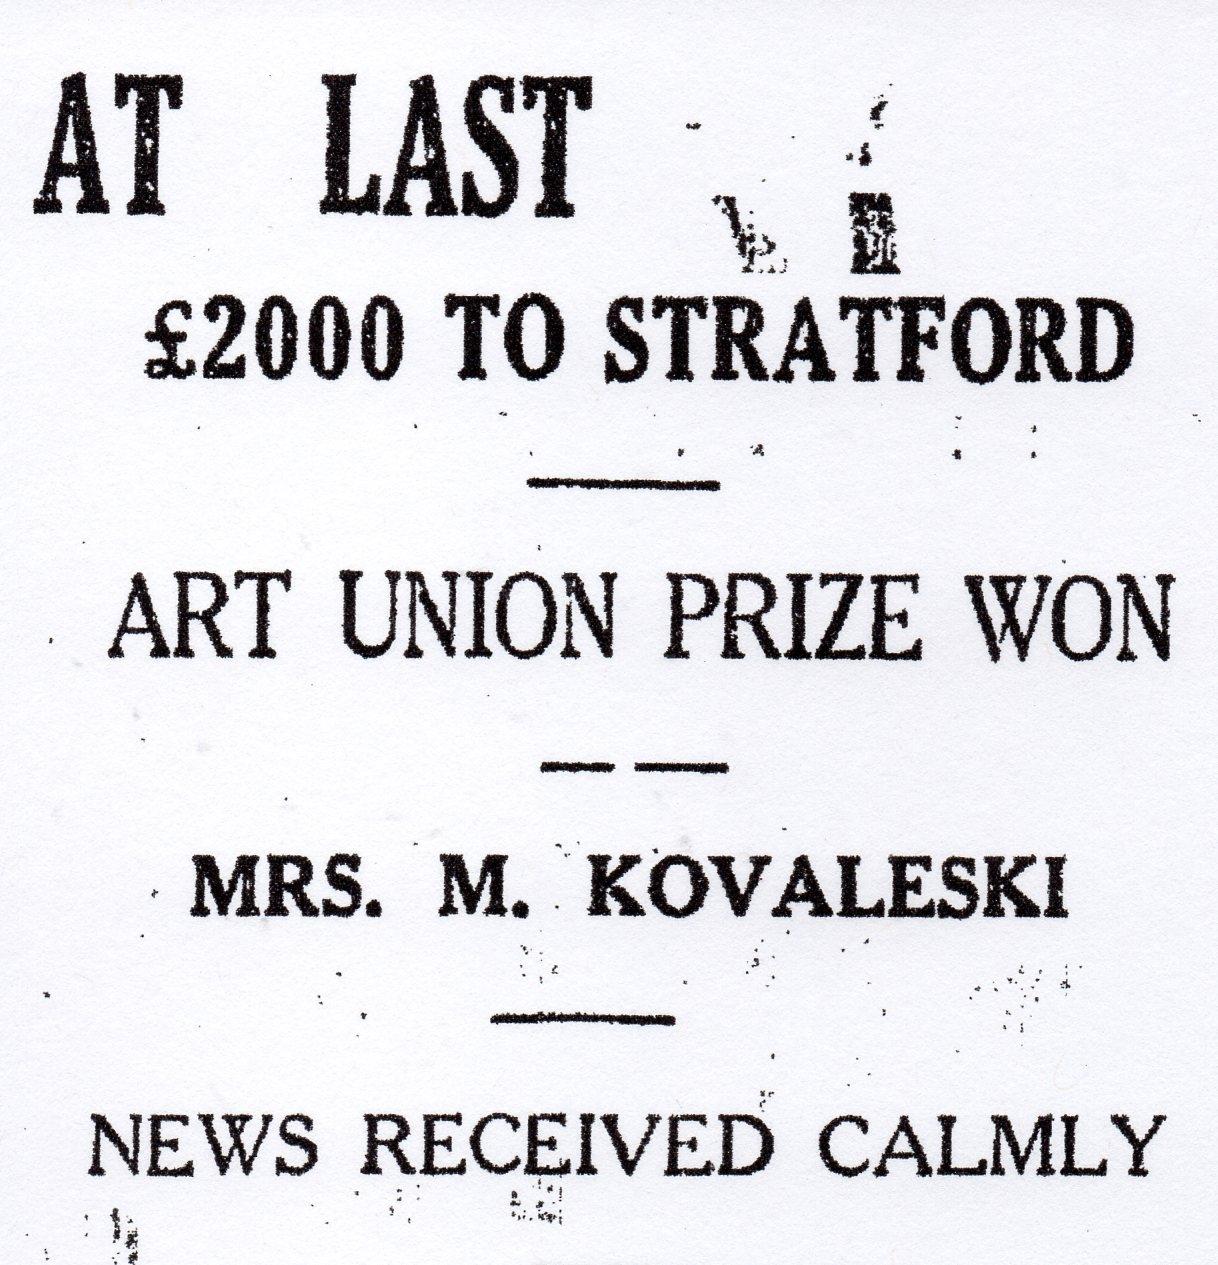 The newspaper  headline, AT LAST ₤2000 TO STRATFORD, ART UNION PRIZE, MRS M KOVALESKI, NEWS RECEIVED CALMLY